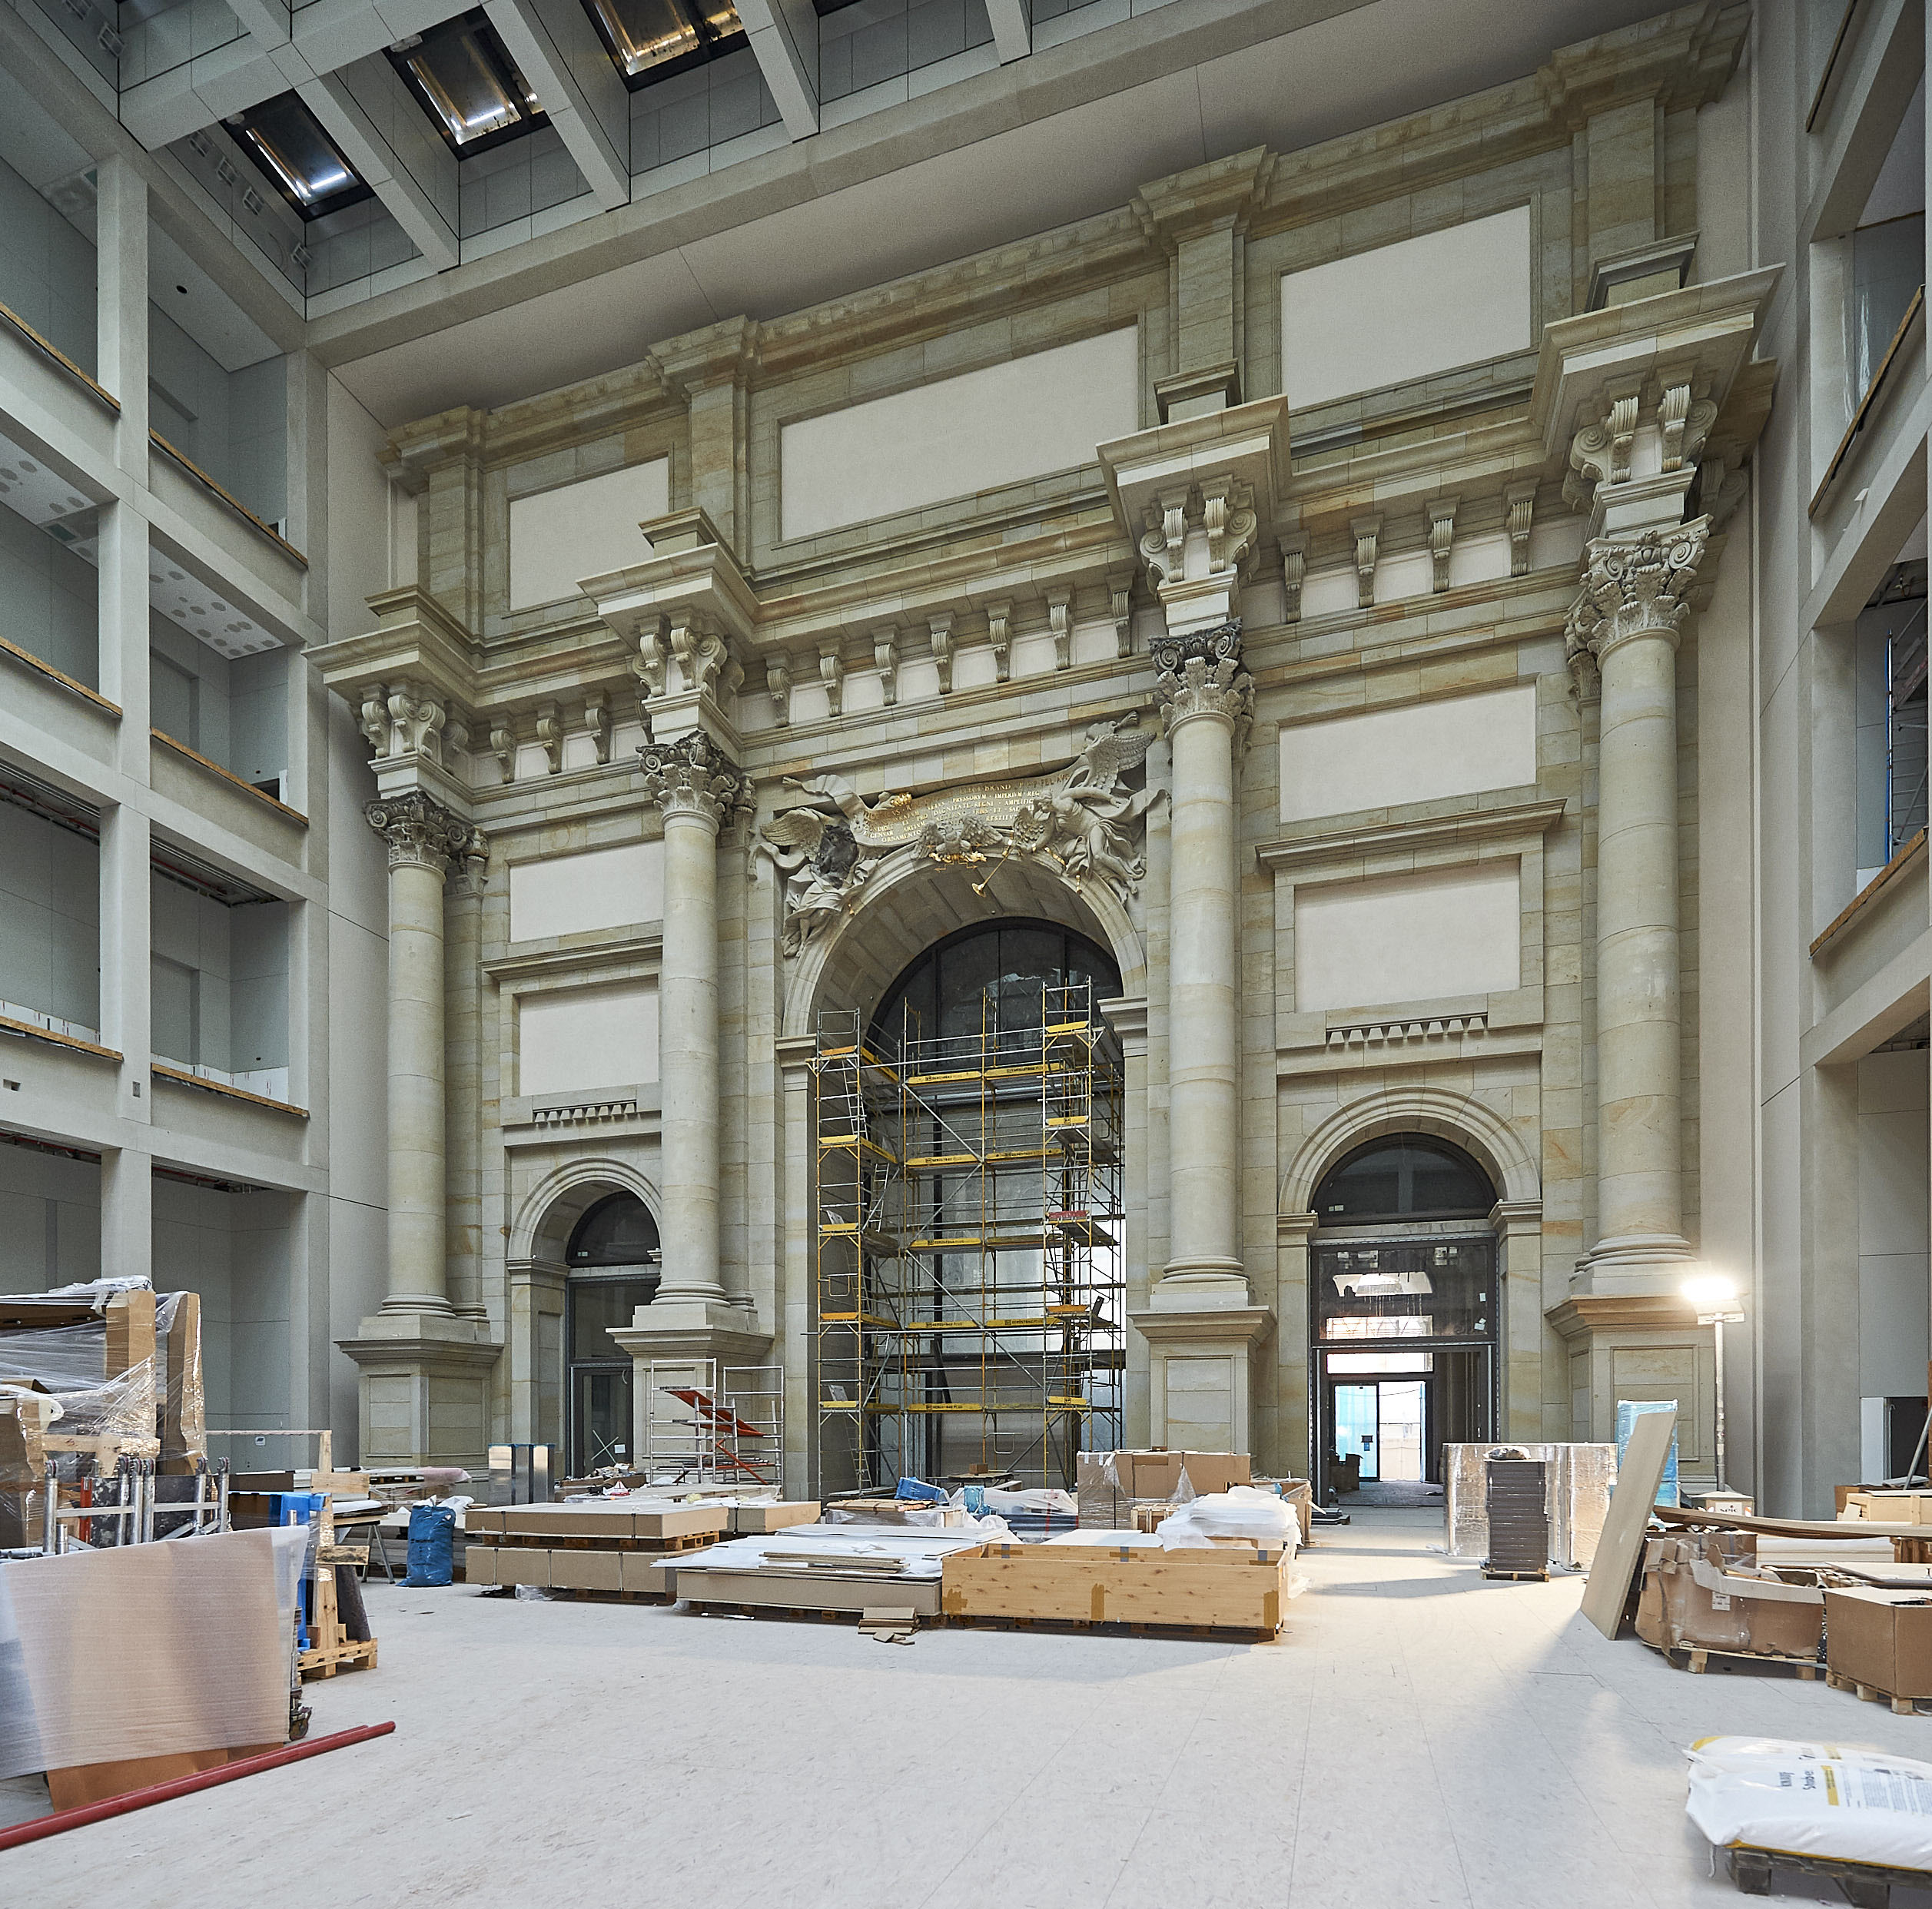 Mplus-SiGeKo-Projekt_HUF_Neubau-Berliner-Schloss_Blick-ins-Foyer-mit-Eosanderportal